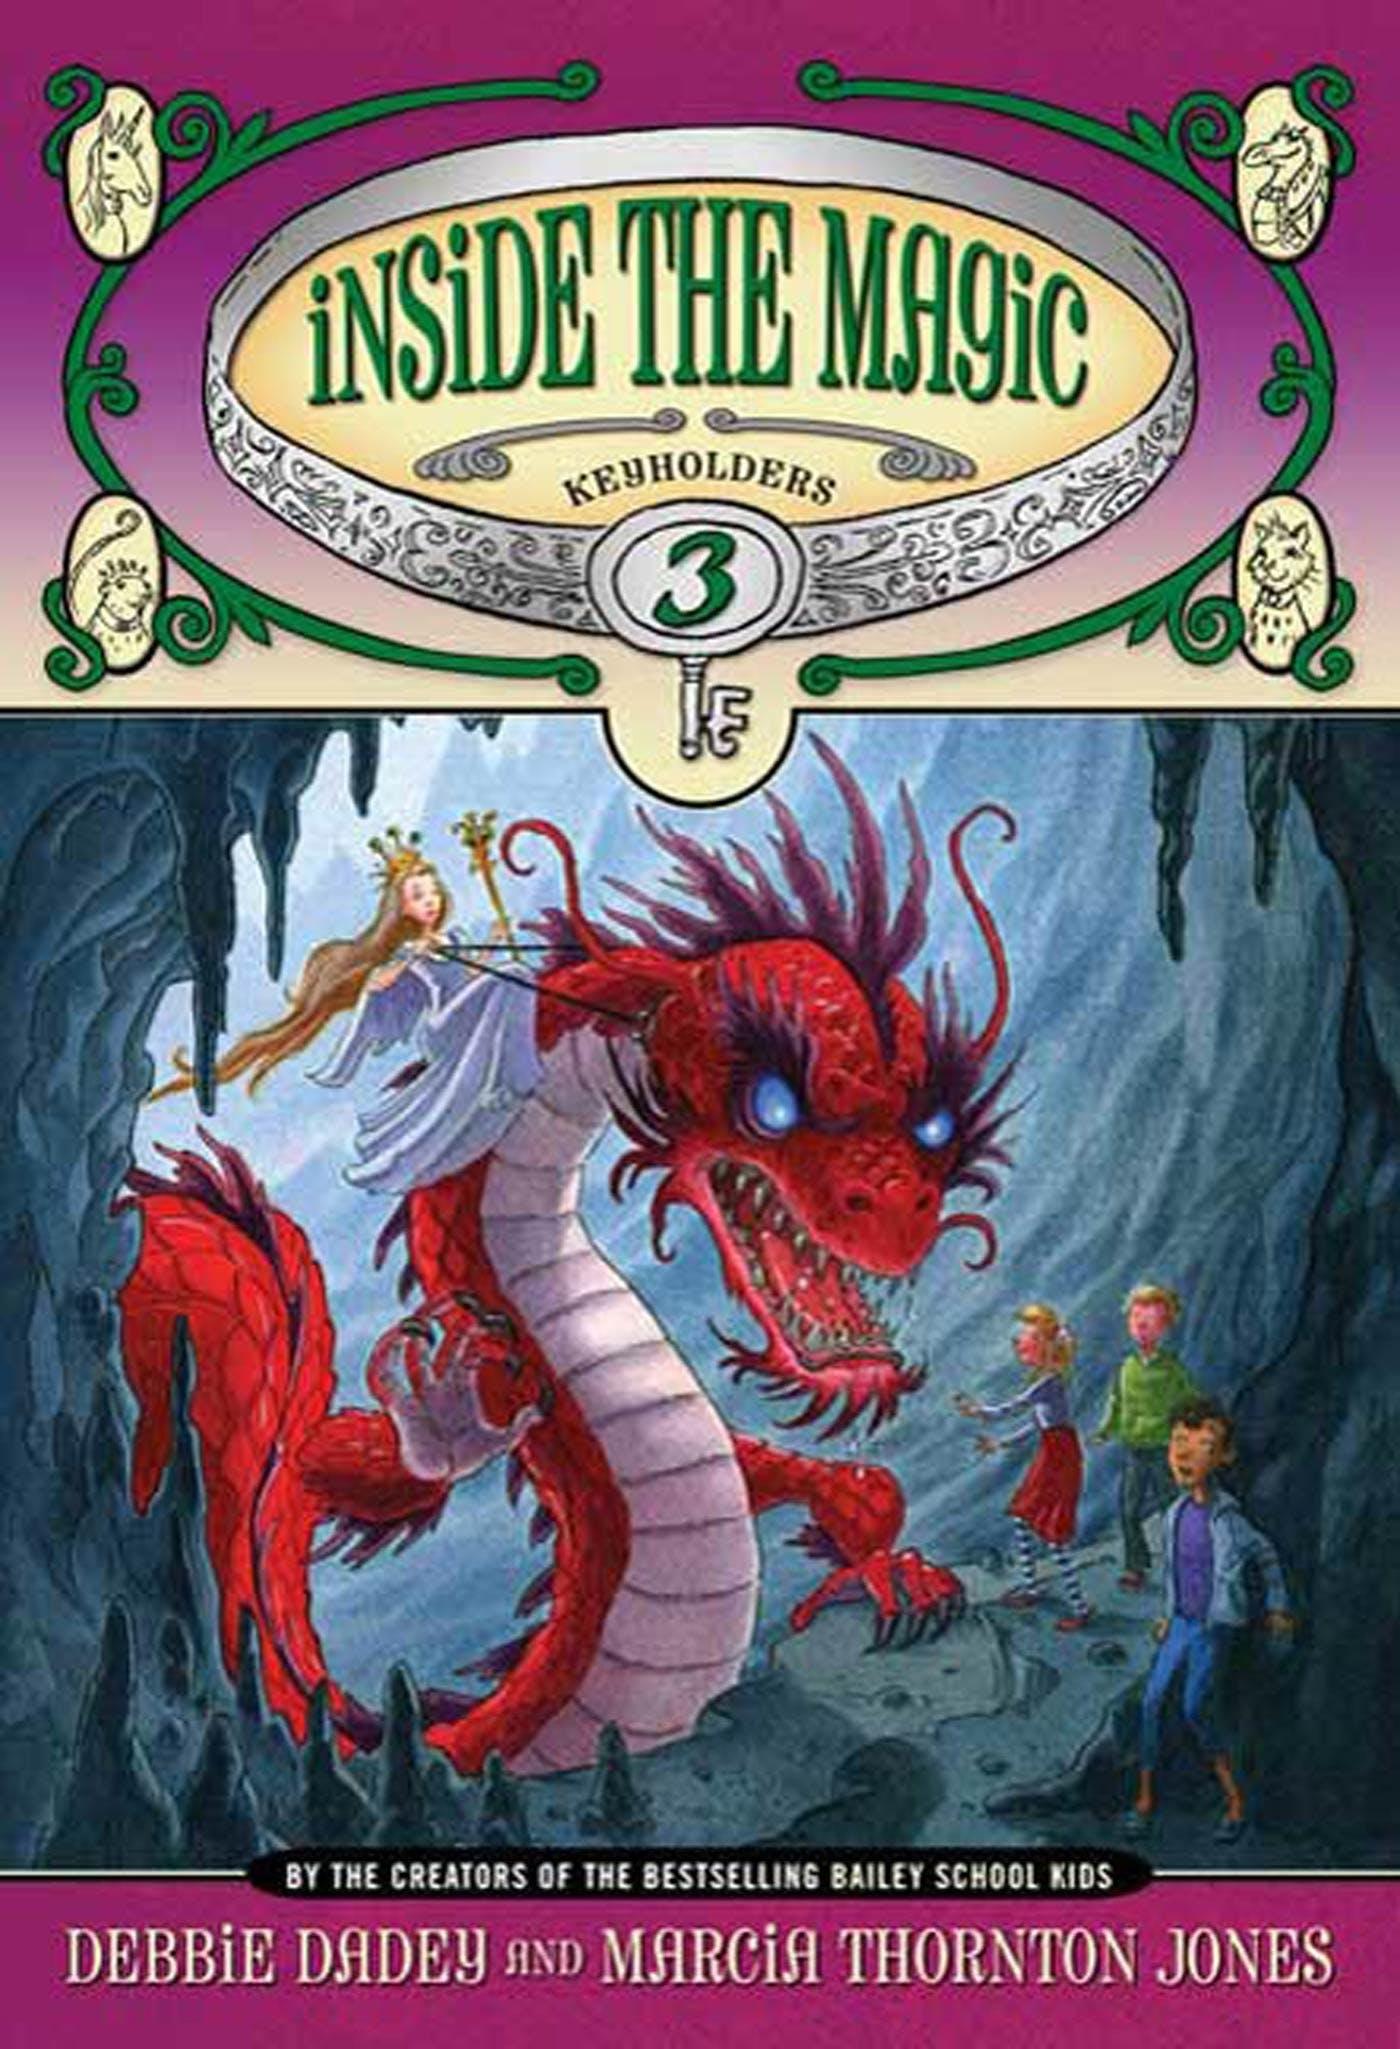 Image of Keyholders #3: Inside the Magic